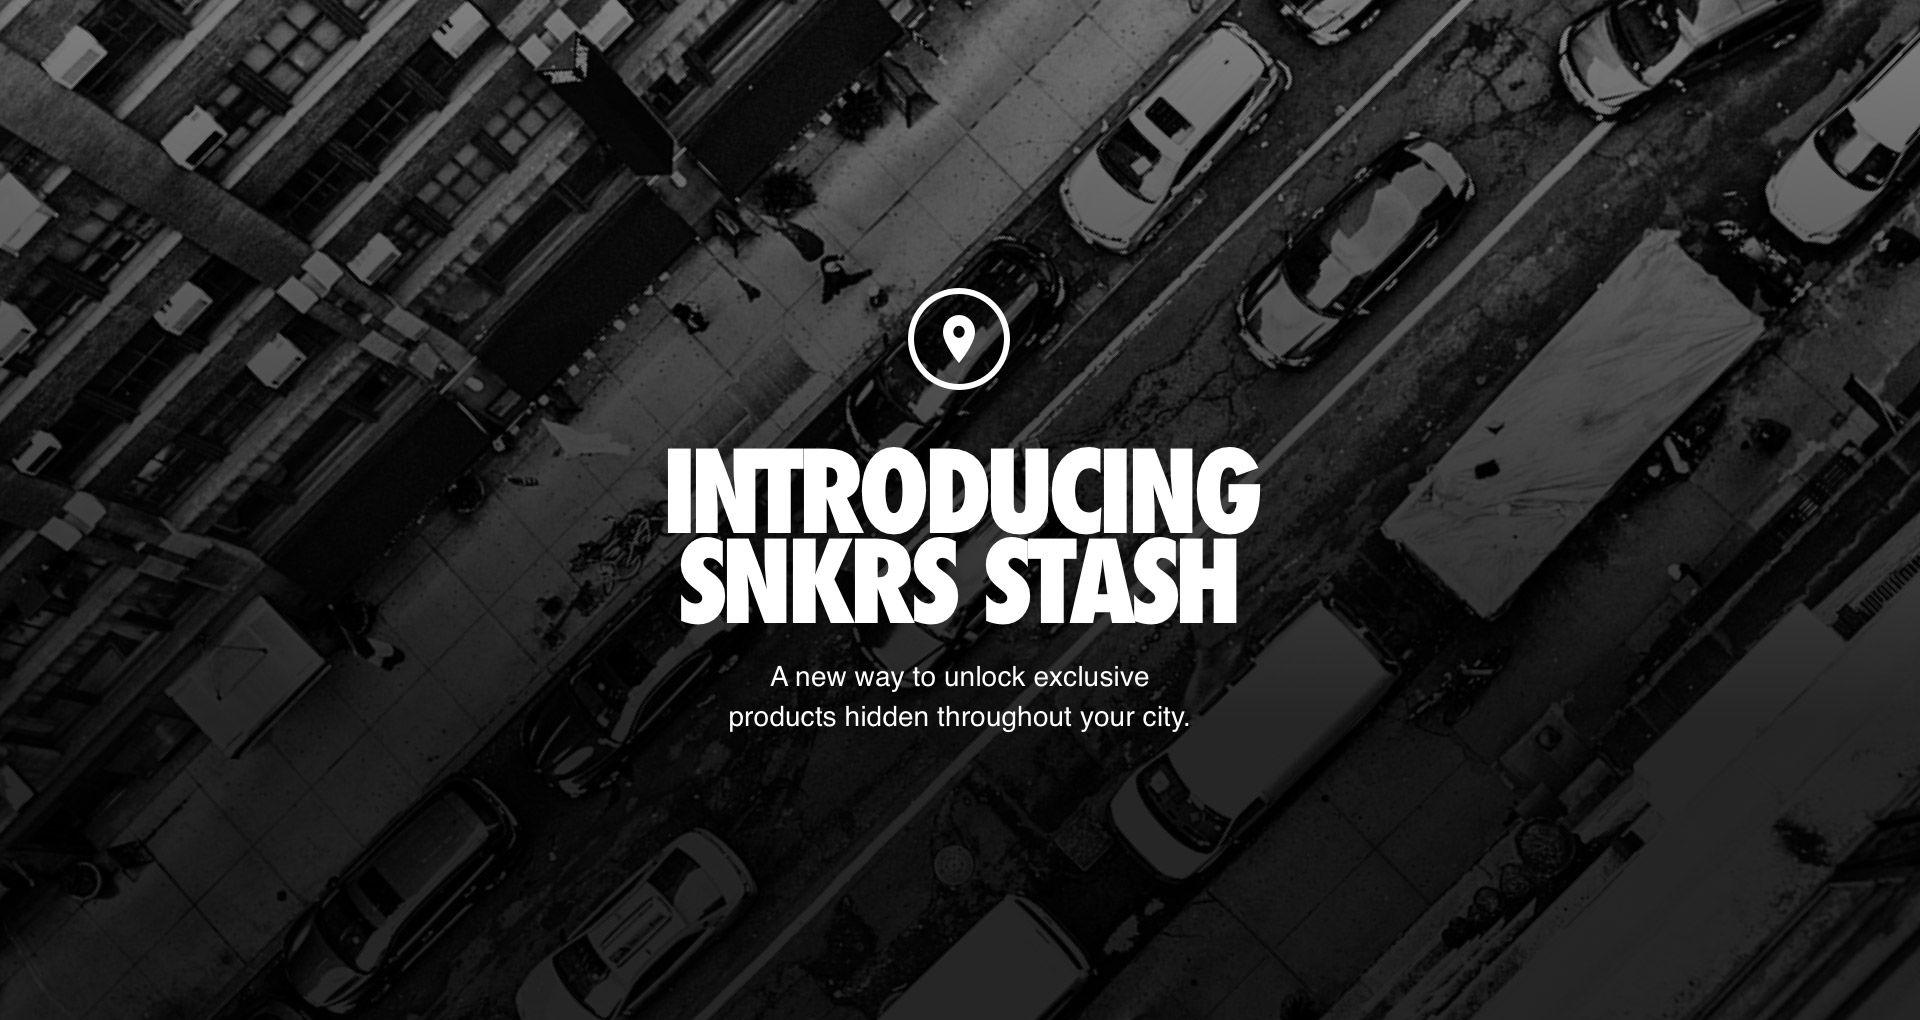 Introducing SNKRS Stash  Nike+ SNKRS